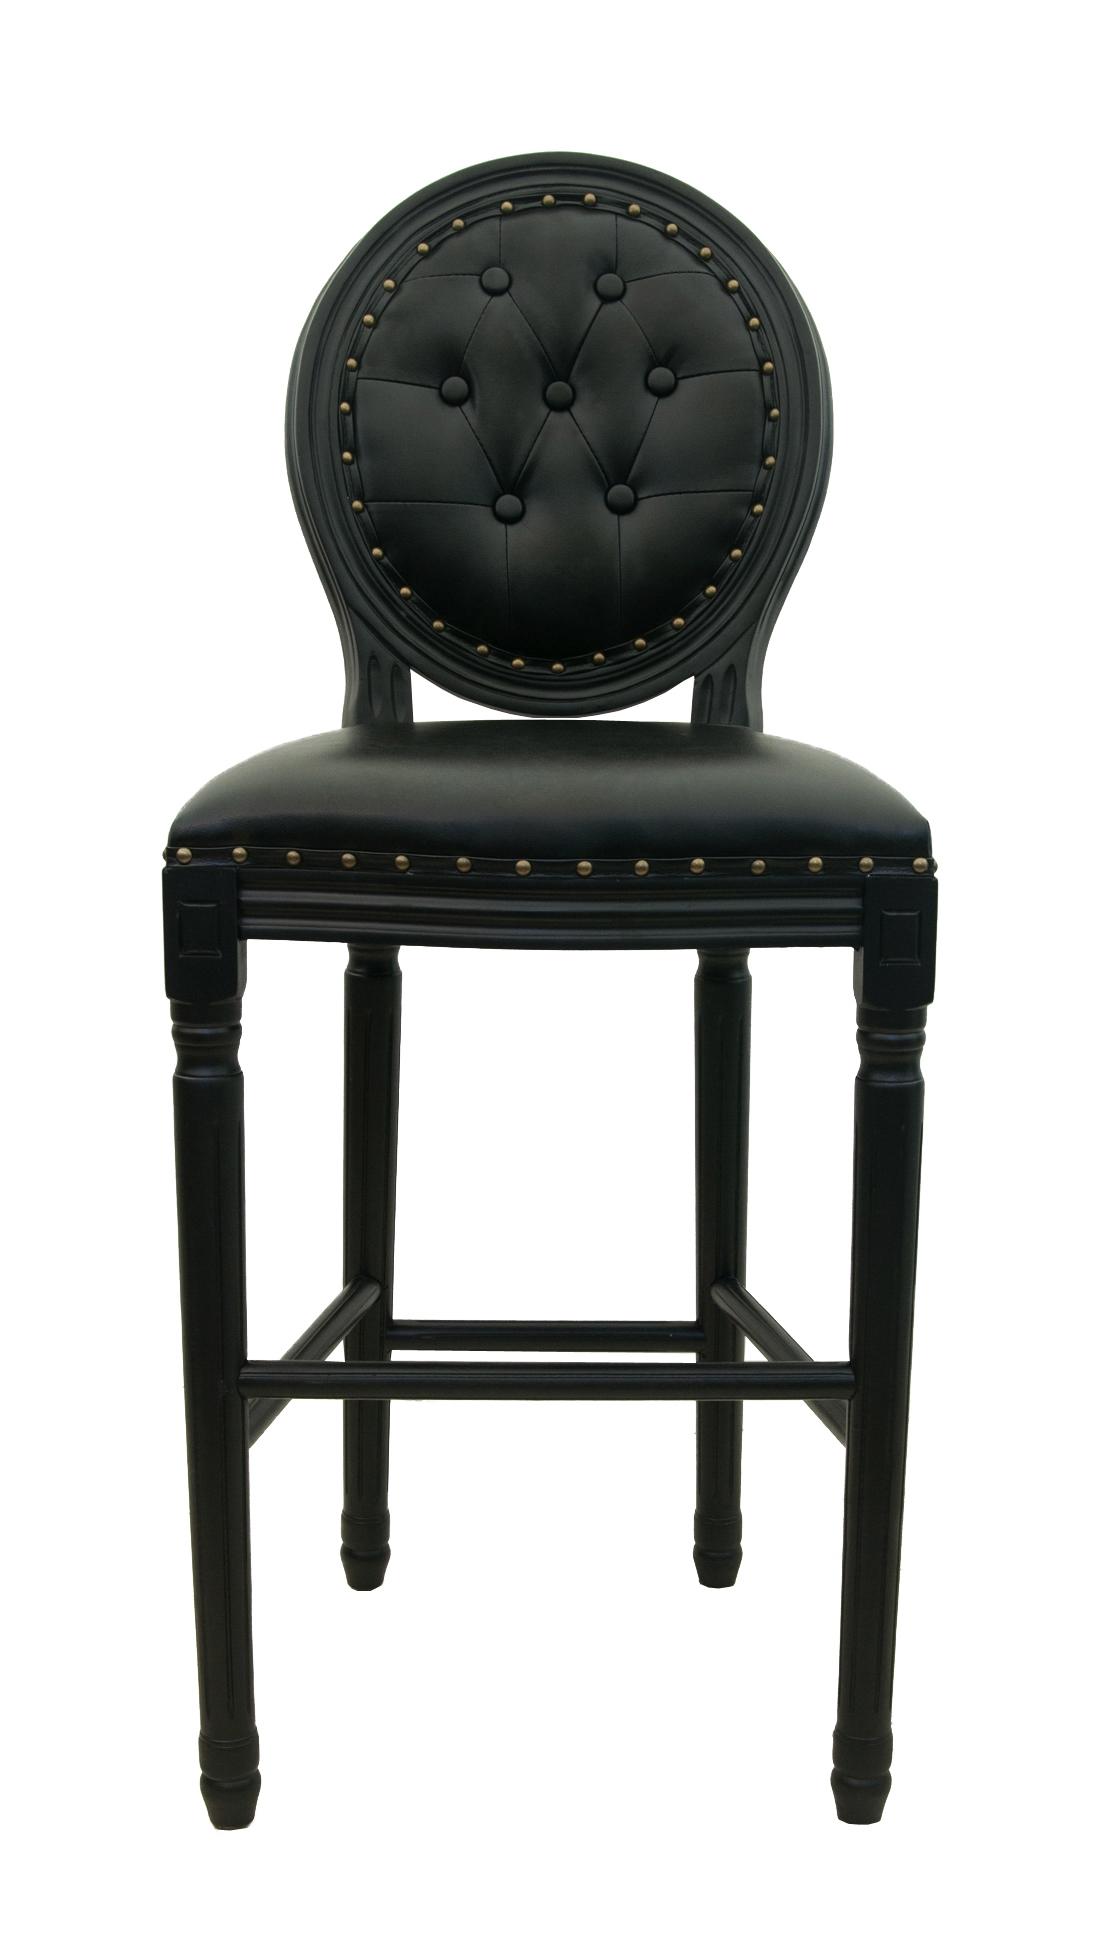 Фото #1: Барный стул Filon Button Black